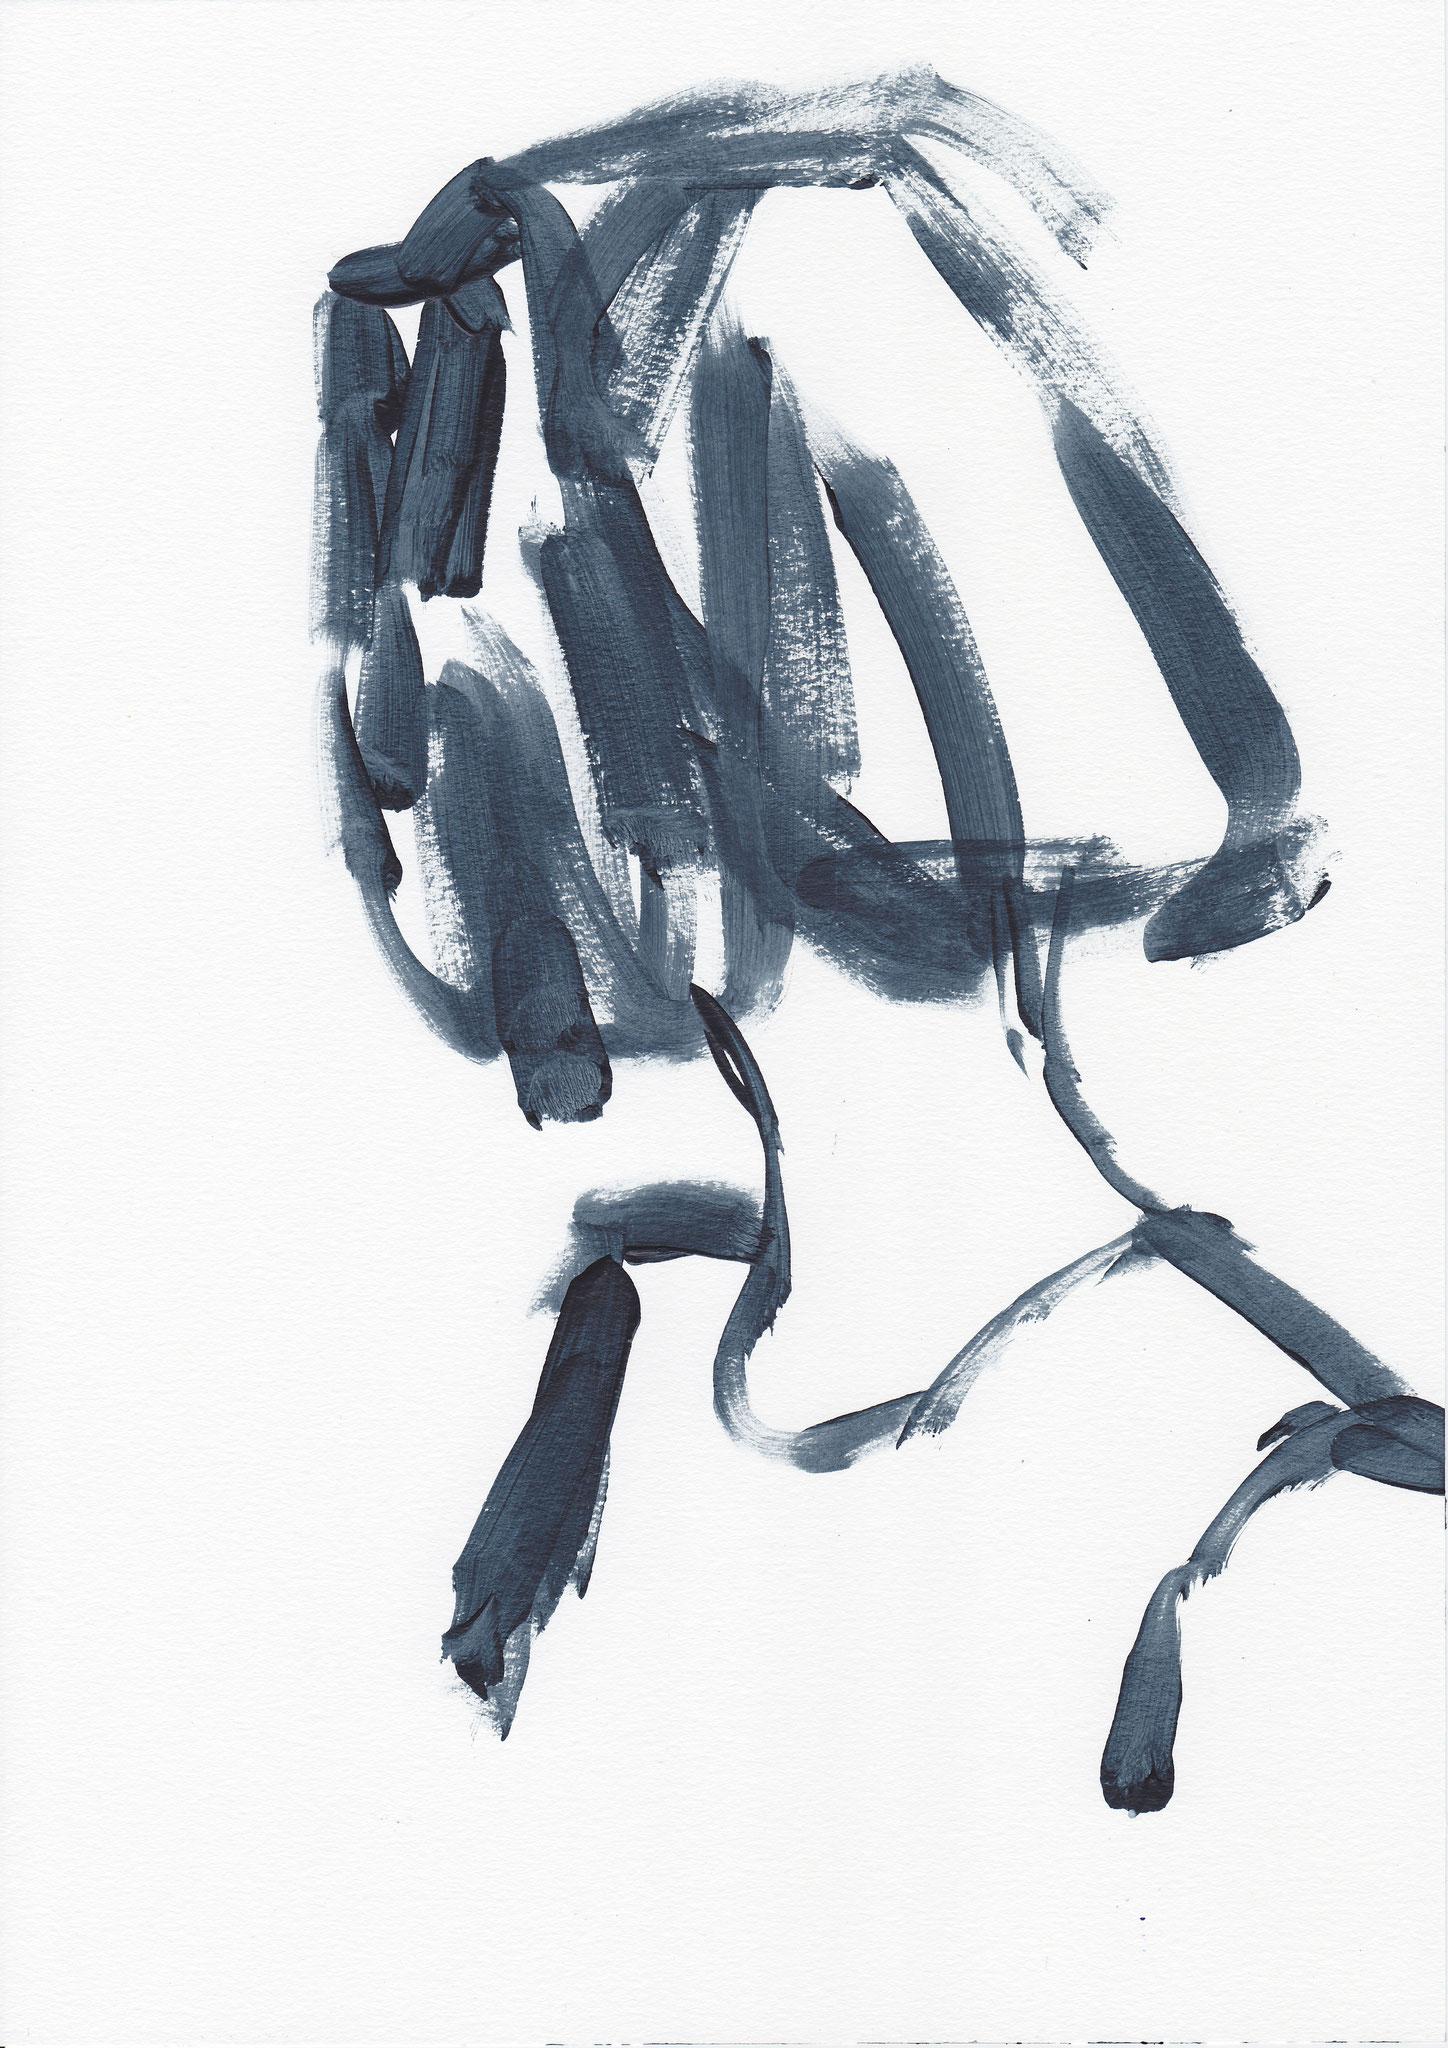 002 , acrylic on paper , 29.7 x 21cm , Selina Saranova